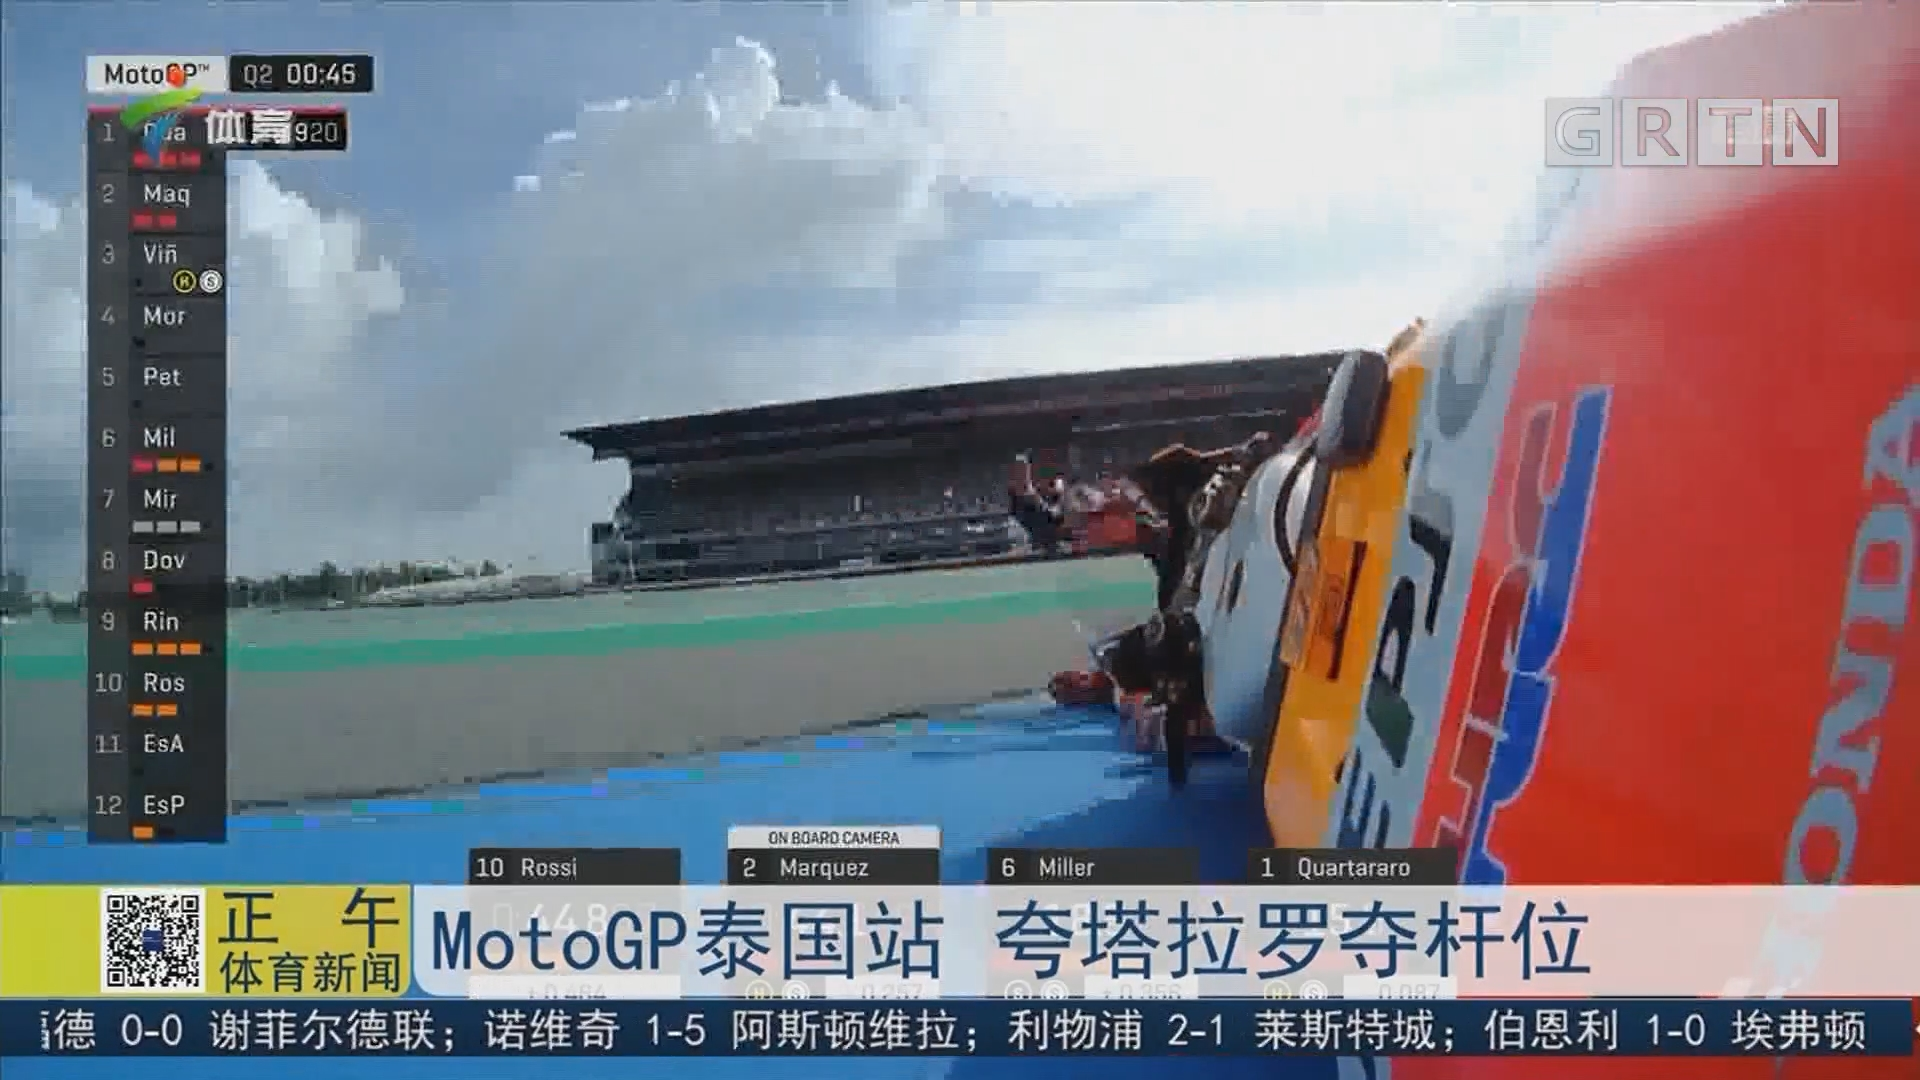 MotoGP泰国站 夸塔拉罗夺杆位